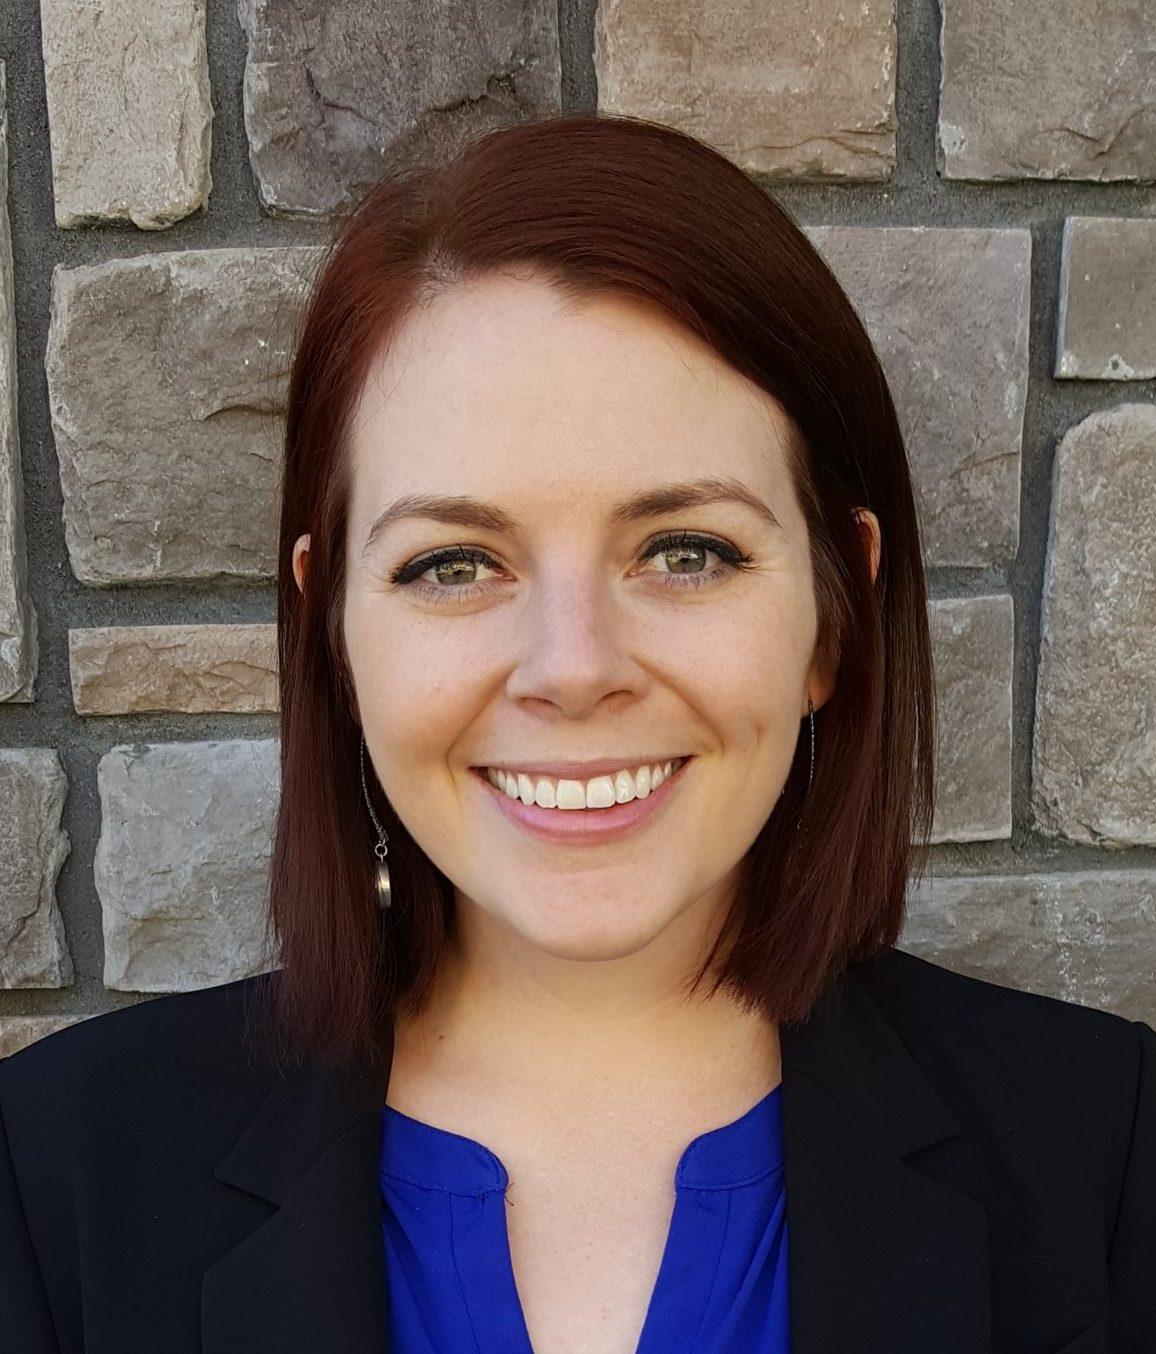 Attorney Megan K. Paull